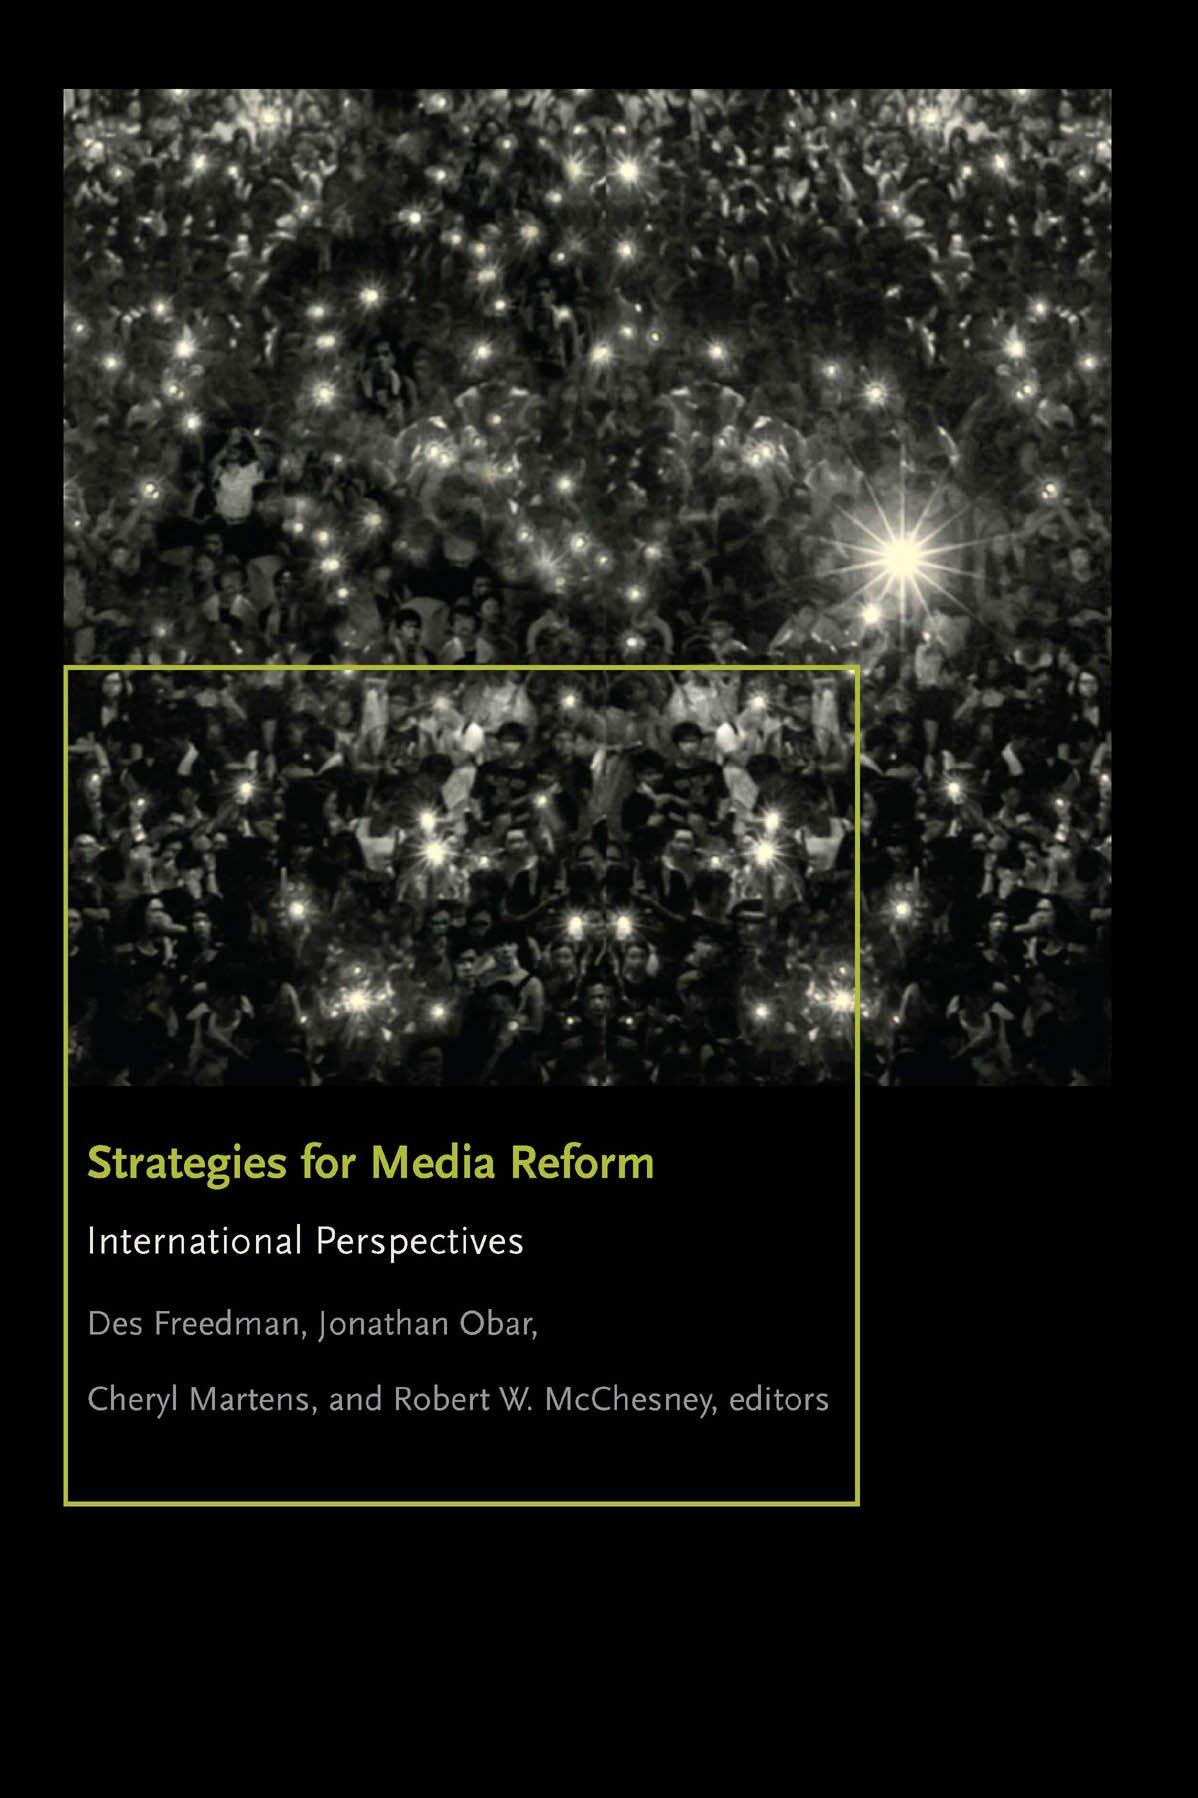 strategies for media reform